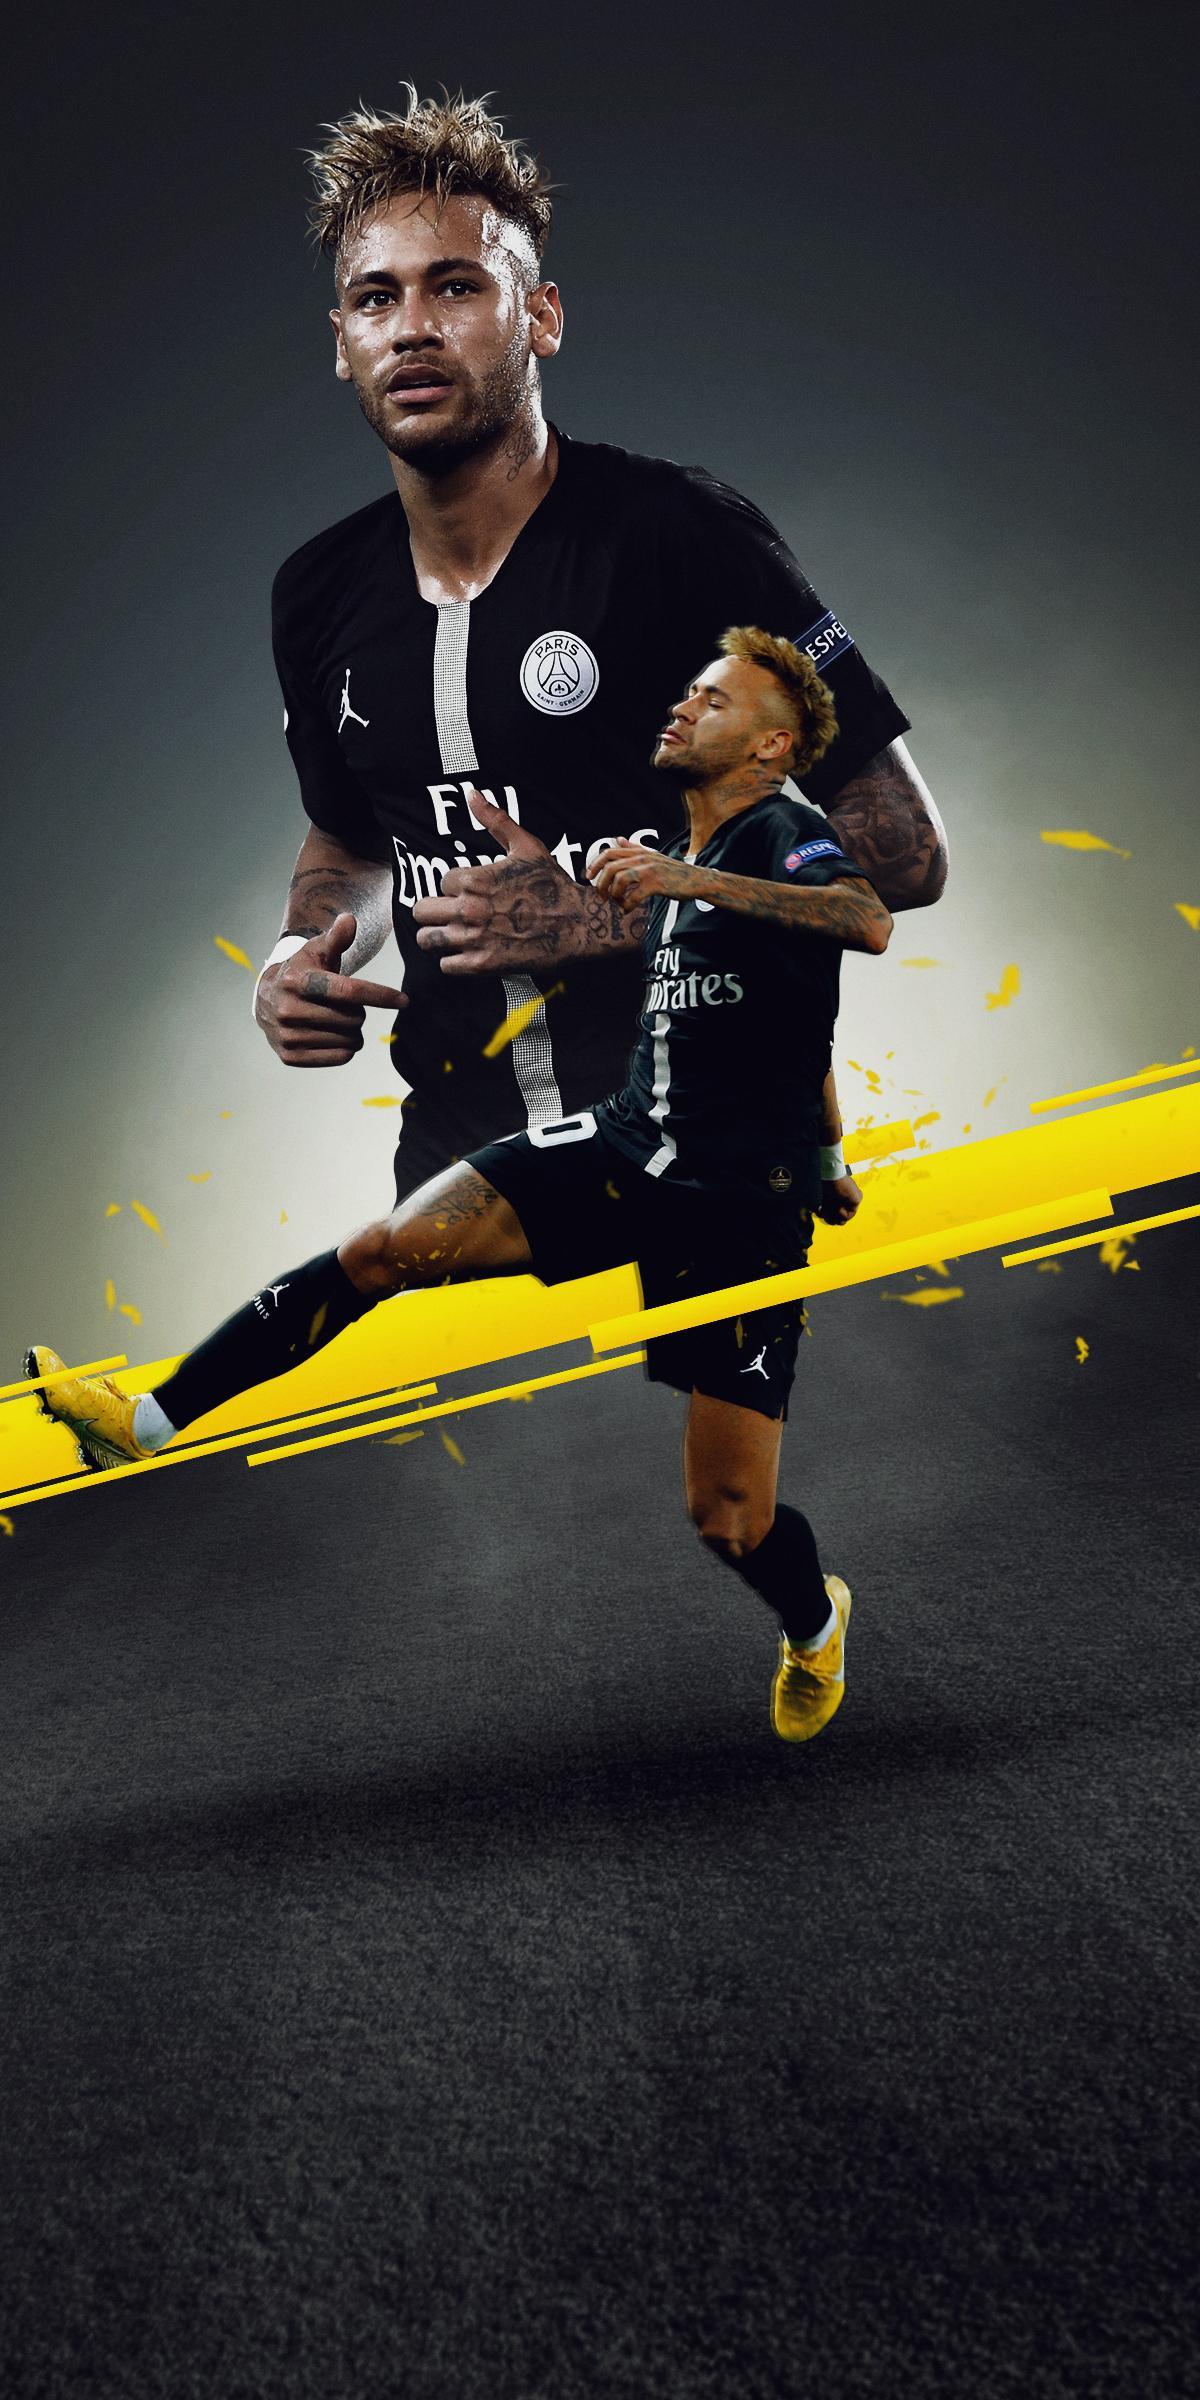 neymar wallpaper hd psg 2019